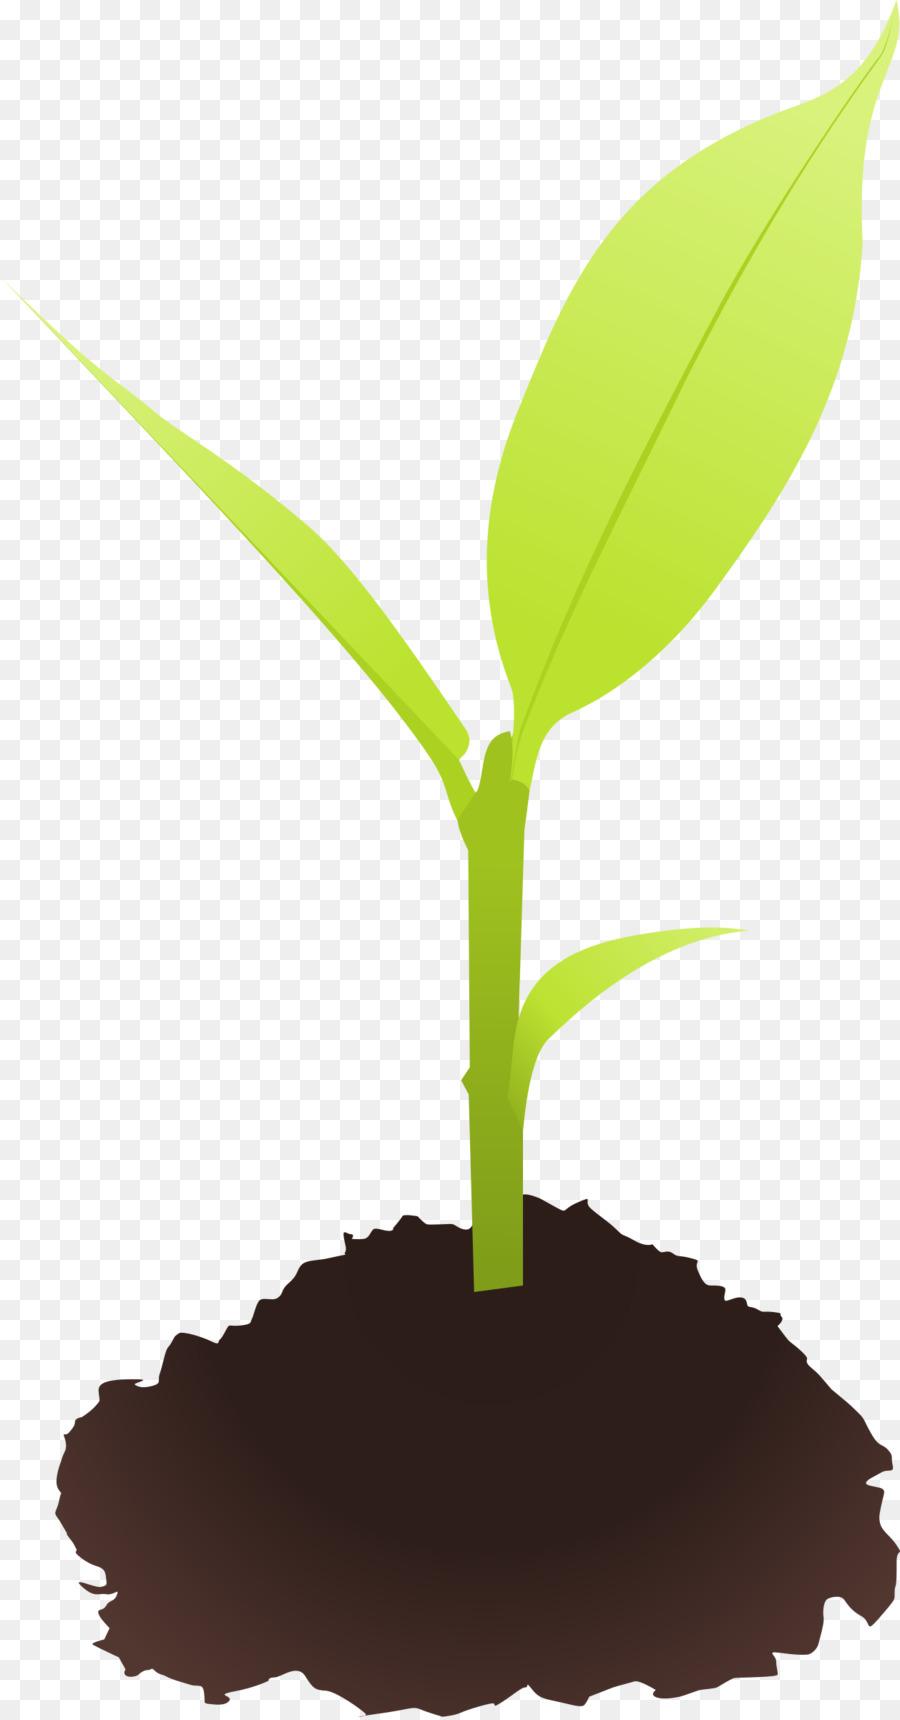 banner transparent stock Seedling clipart. Family tree background illustration.